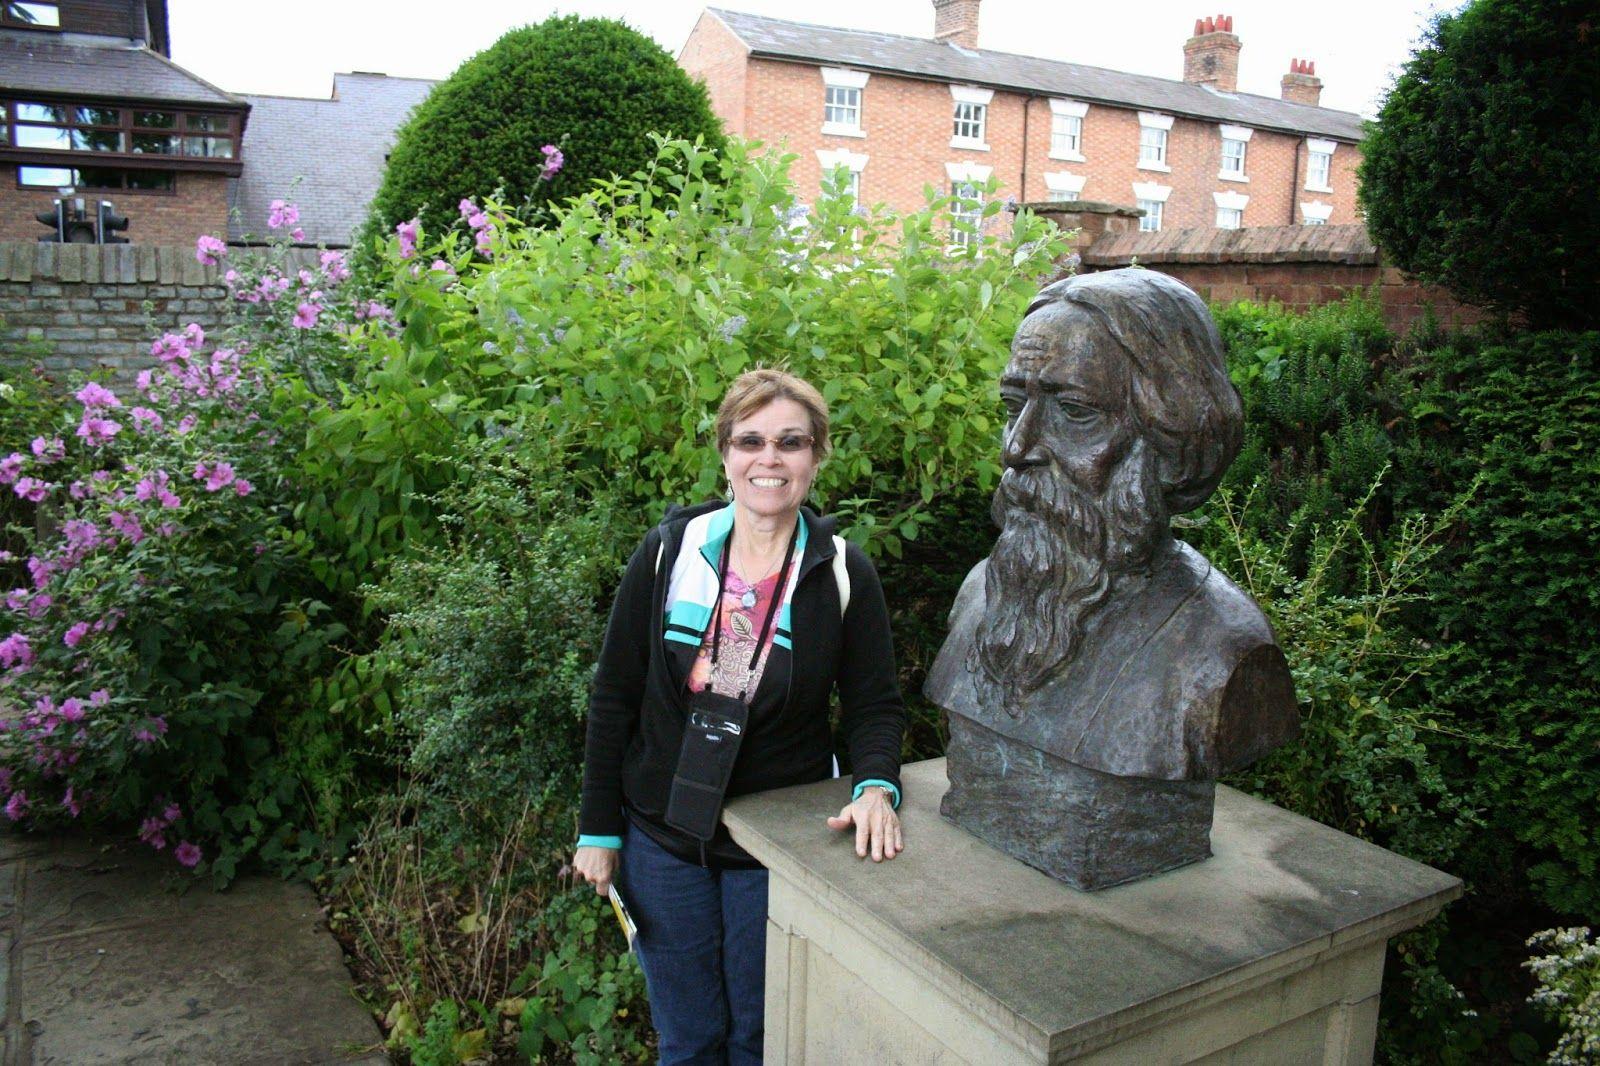 Author mary ann bernal britonanddane writerslife